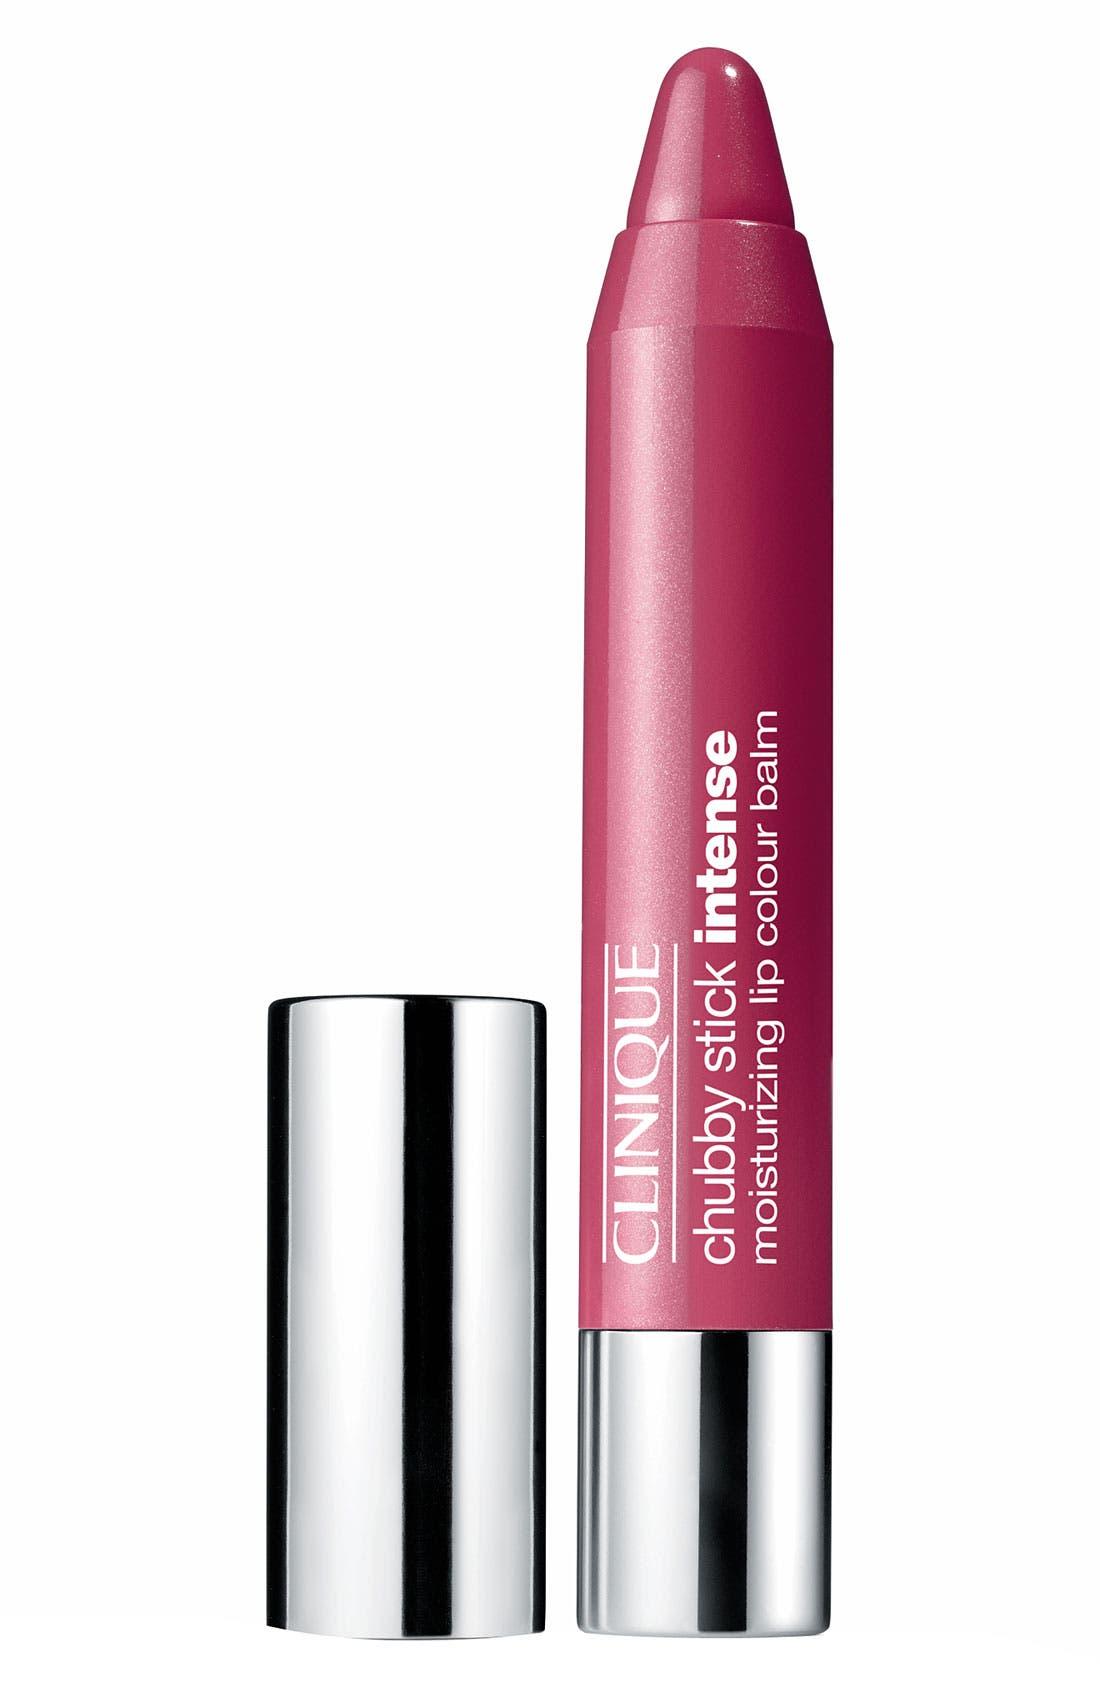 Chubby Stick Intense Moisturizing Lip Color Balm